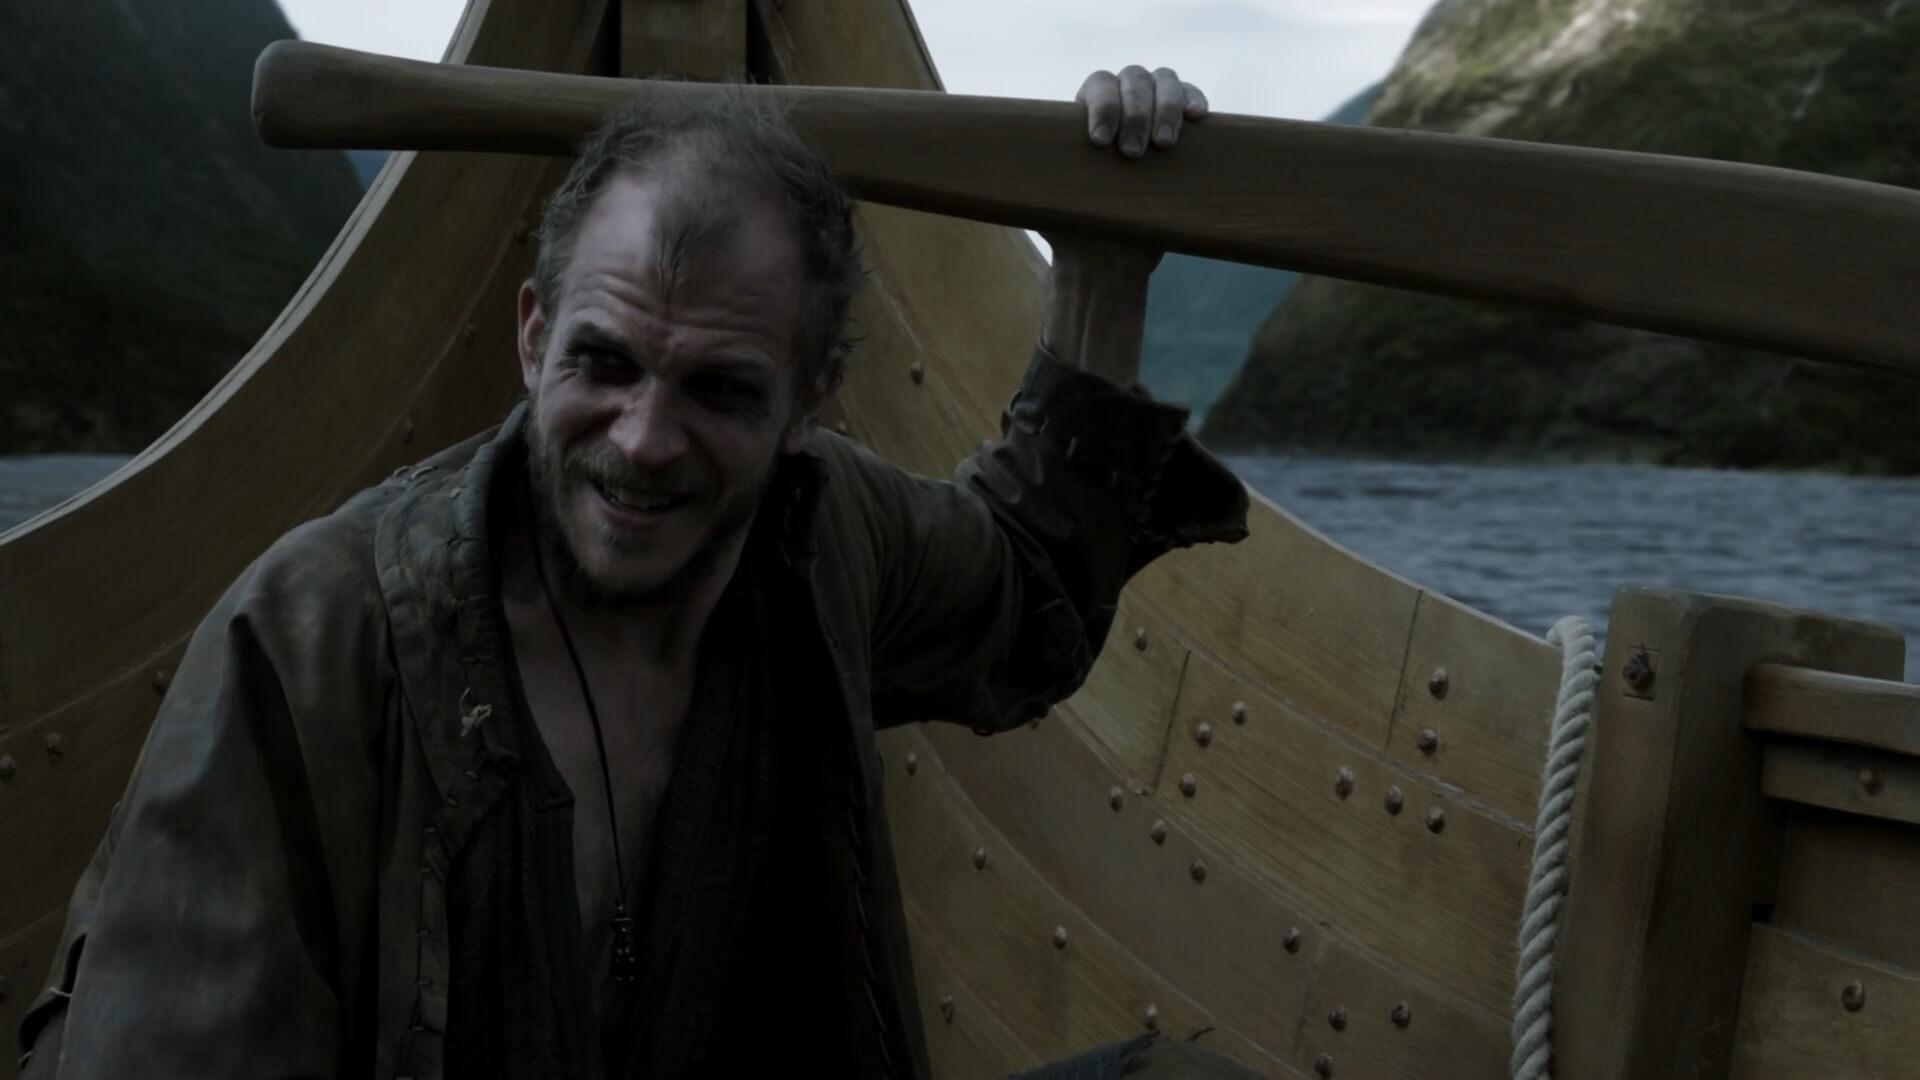 Vikings season 1 480p complete